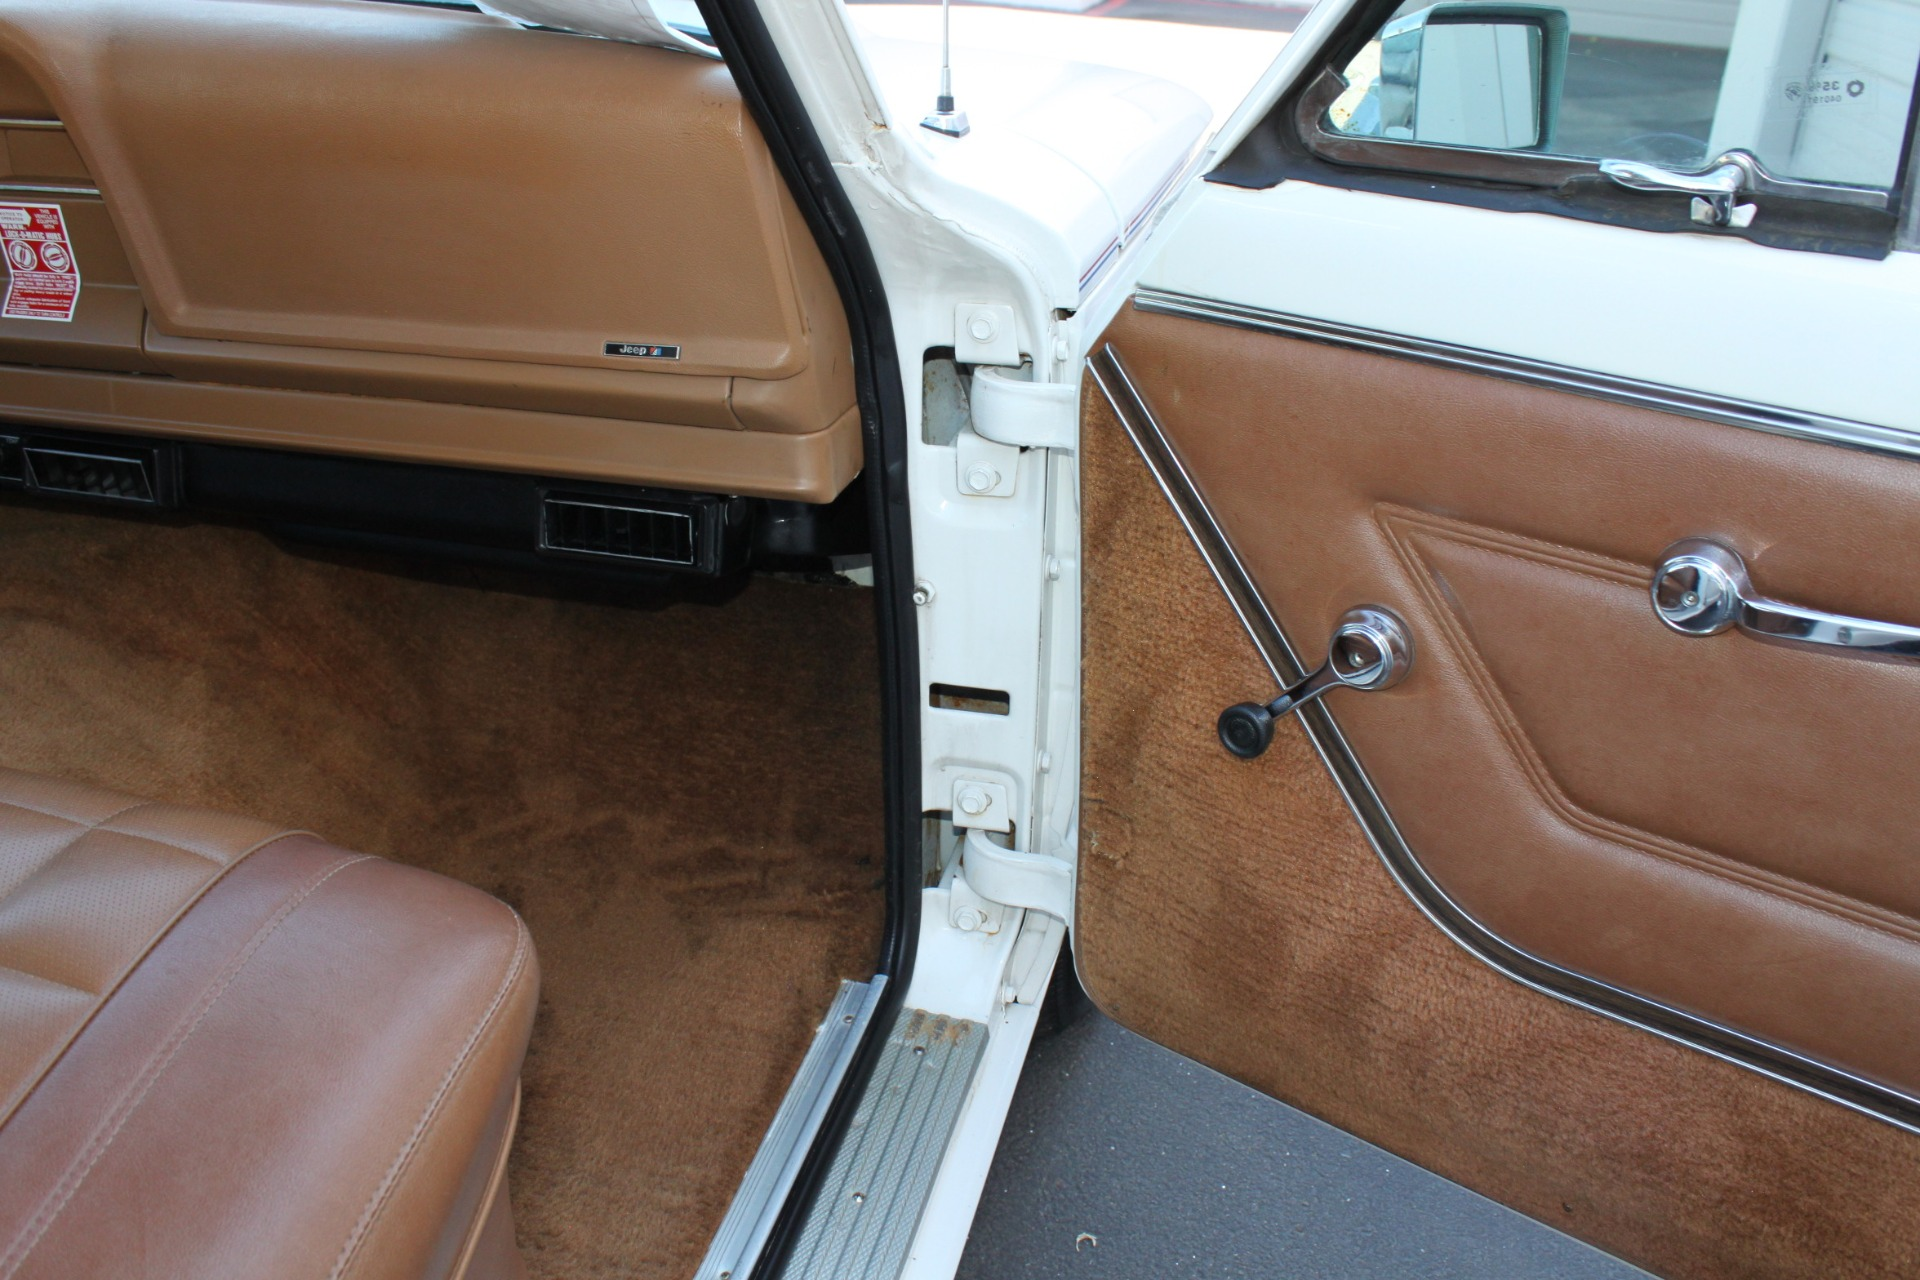 Used-1977-Jeep-Wagoneer-Custom-Fuel-Injected-66-Liter-401-Mercedes-Benz